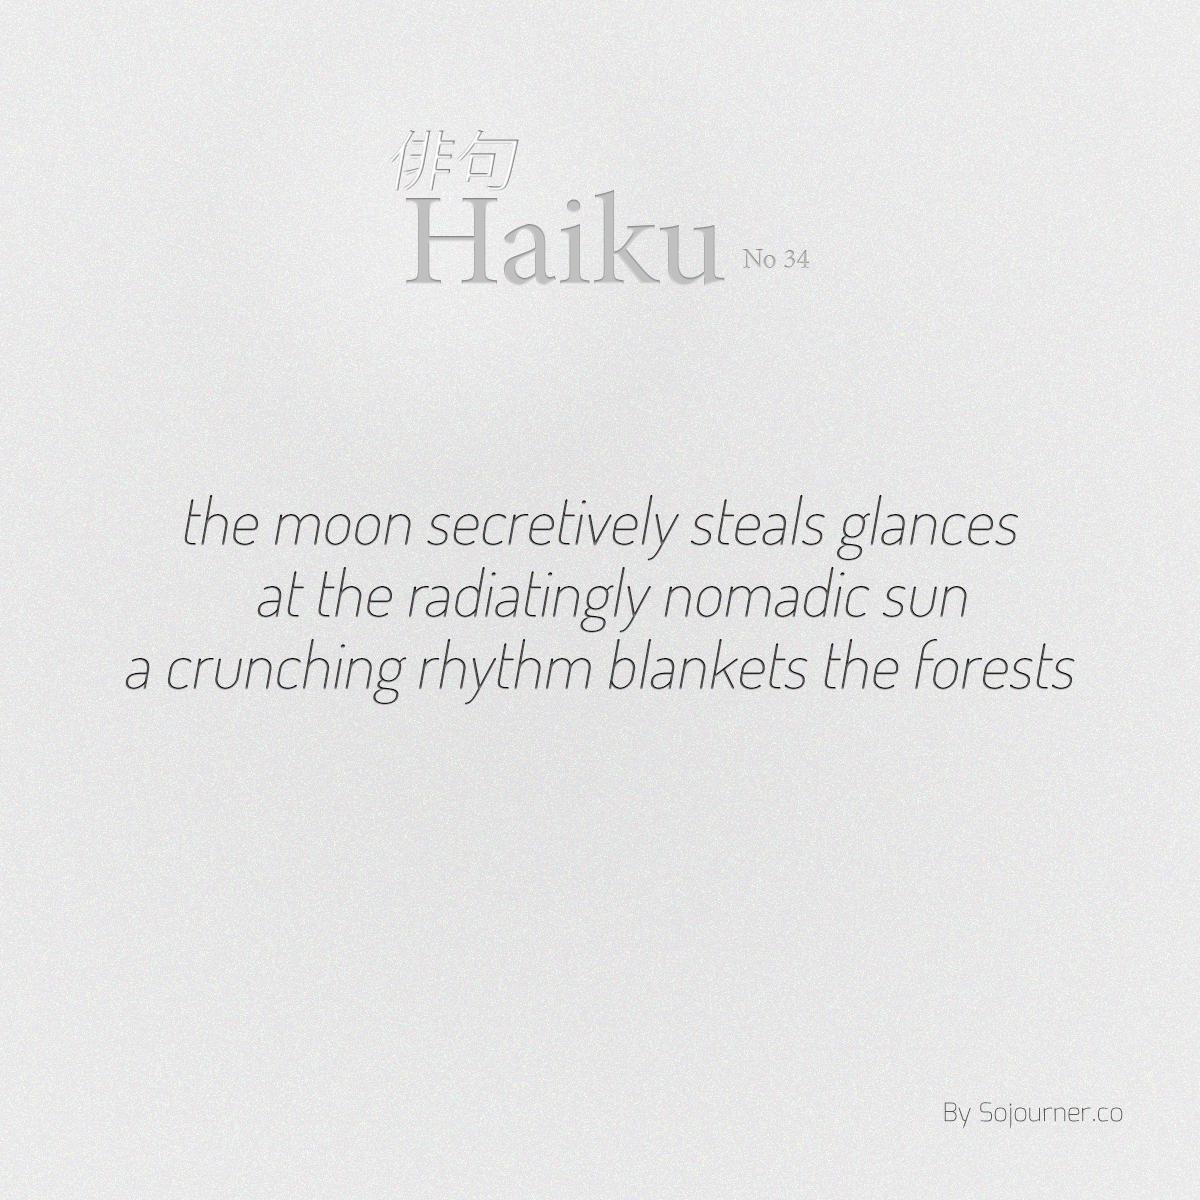 indefiniteloop.com - Haiku No. 34 - After The Fall.